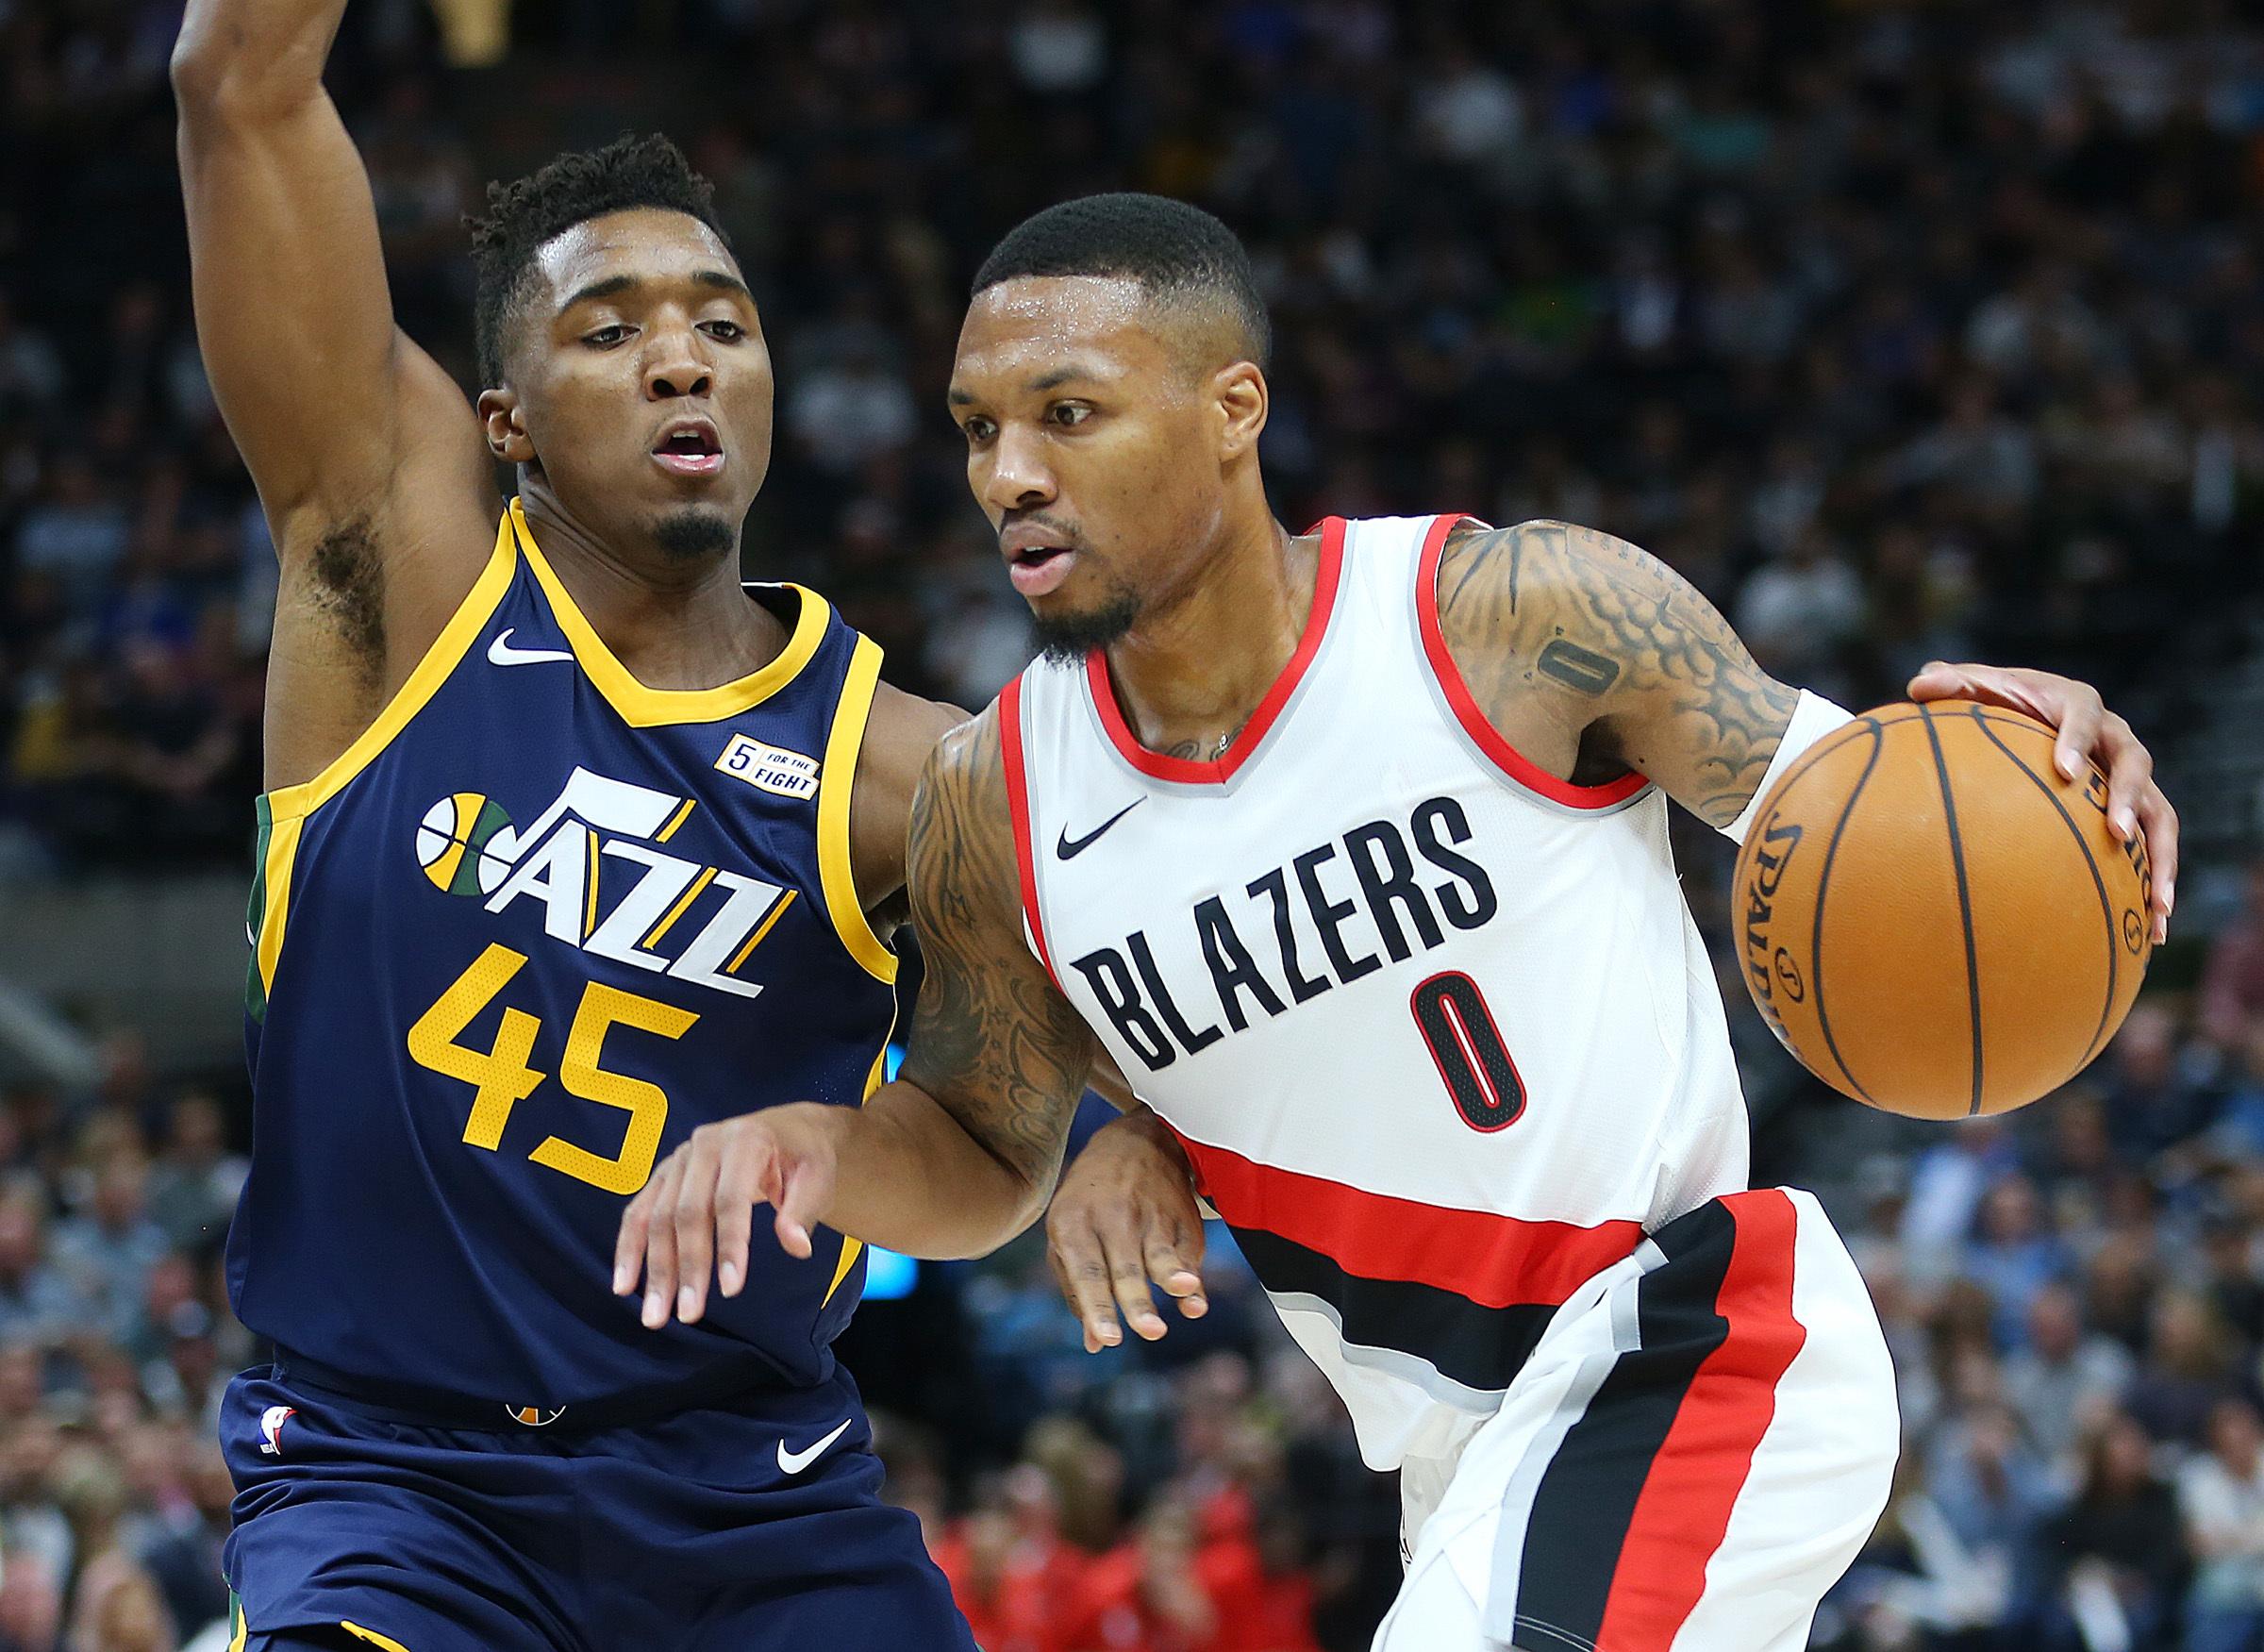 Utah Jazz guard Donovan Mitchell (45) defends Portland Trail Blazers guard Damian Lillard (0) as the Utah Jazz and the Portland Trailblazers play at Vivint Arena in Salt Lake City on Wednesday, Nov. 1, 2017.